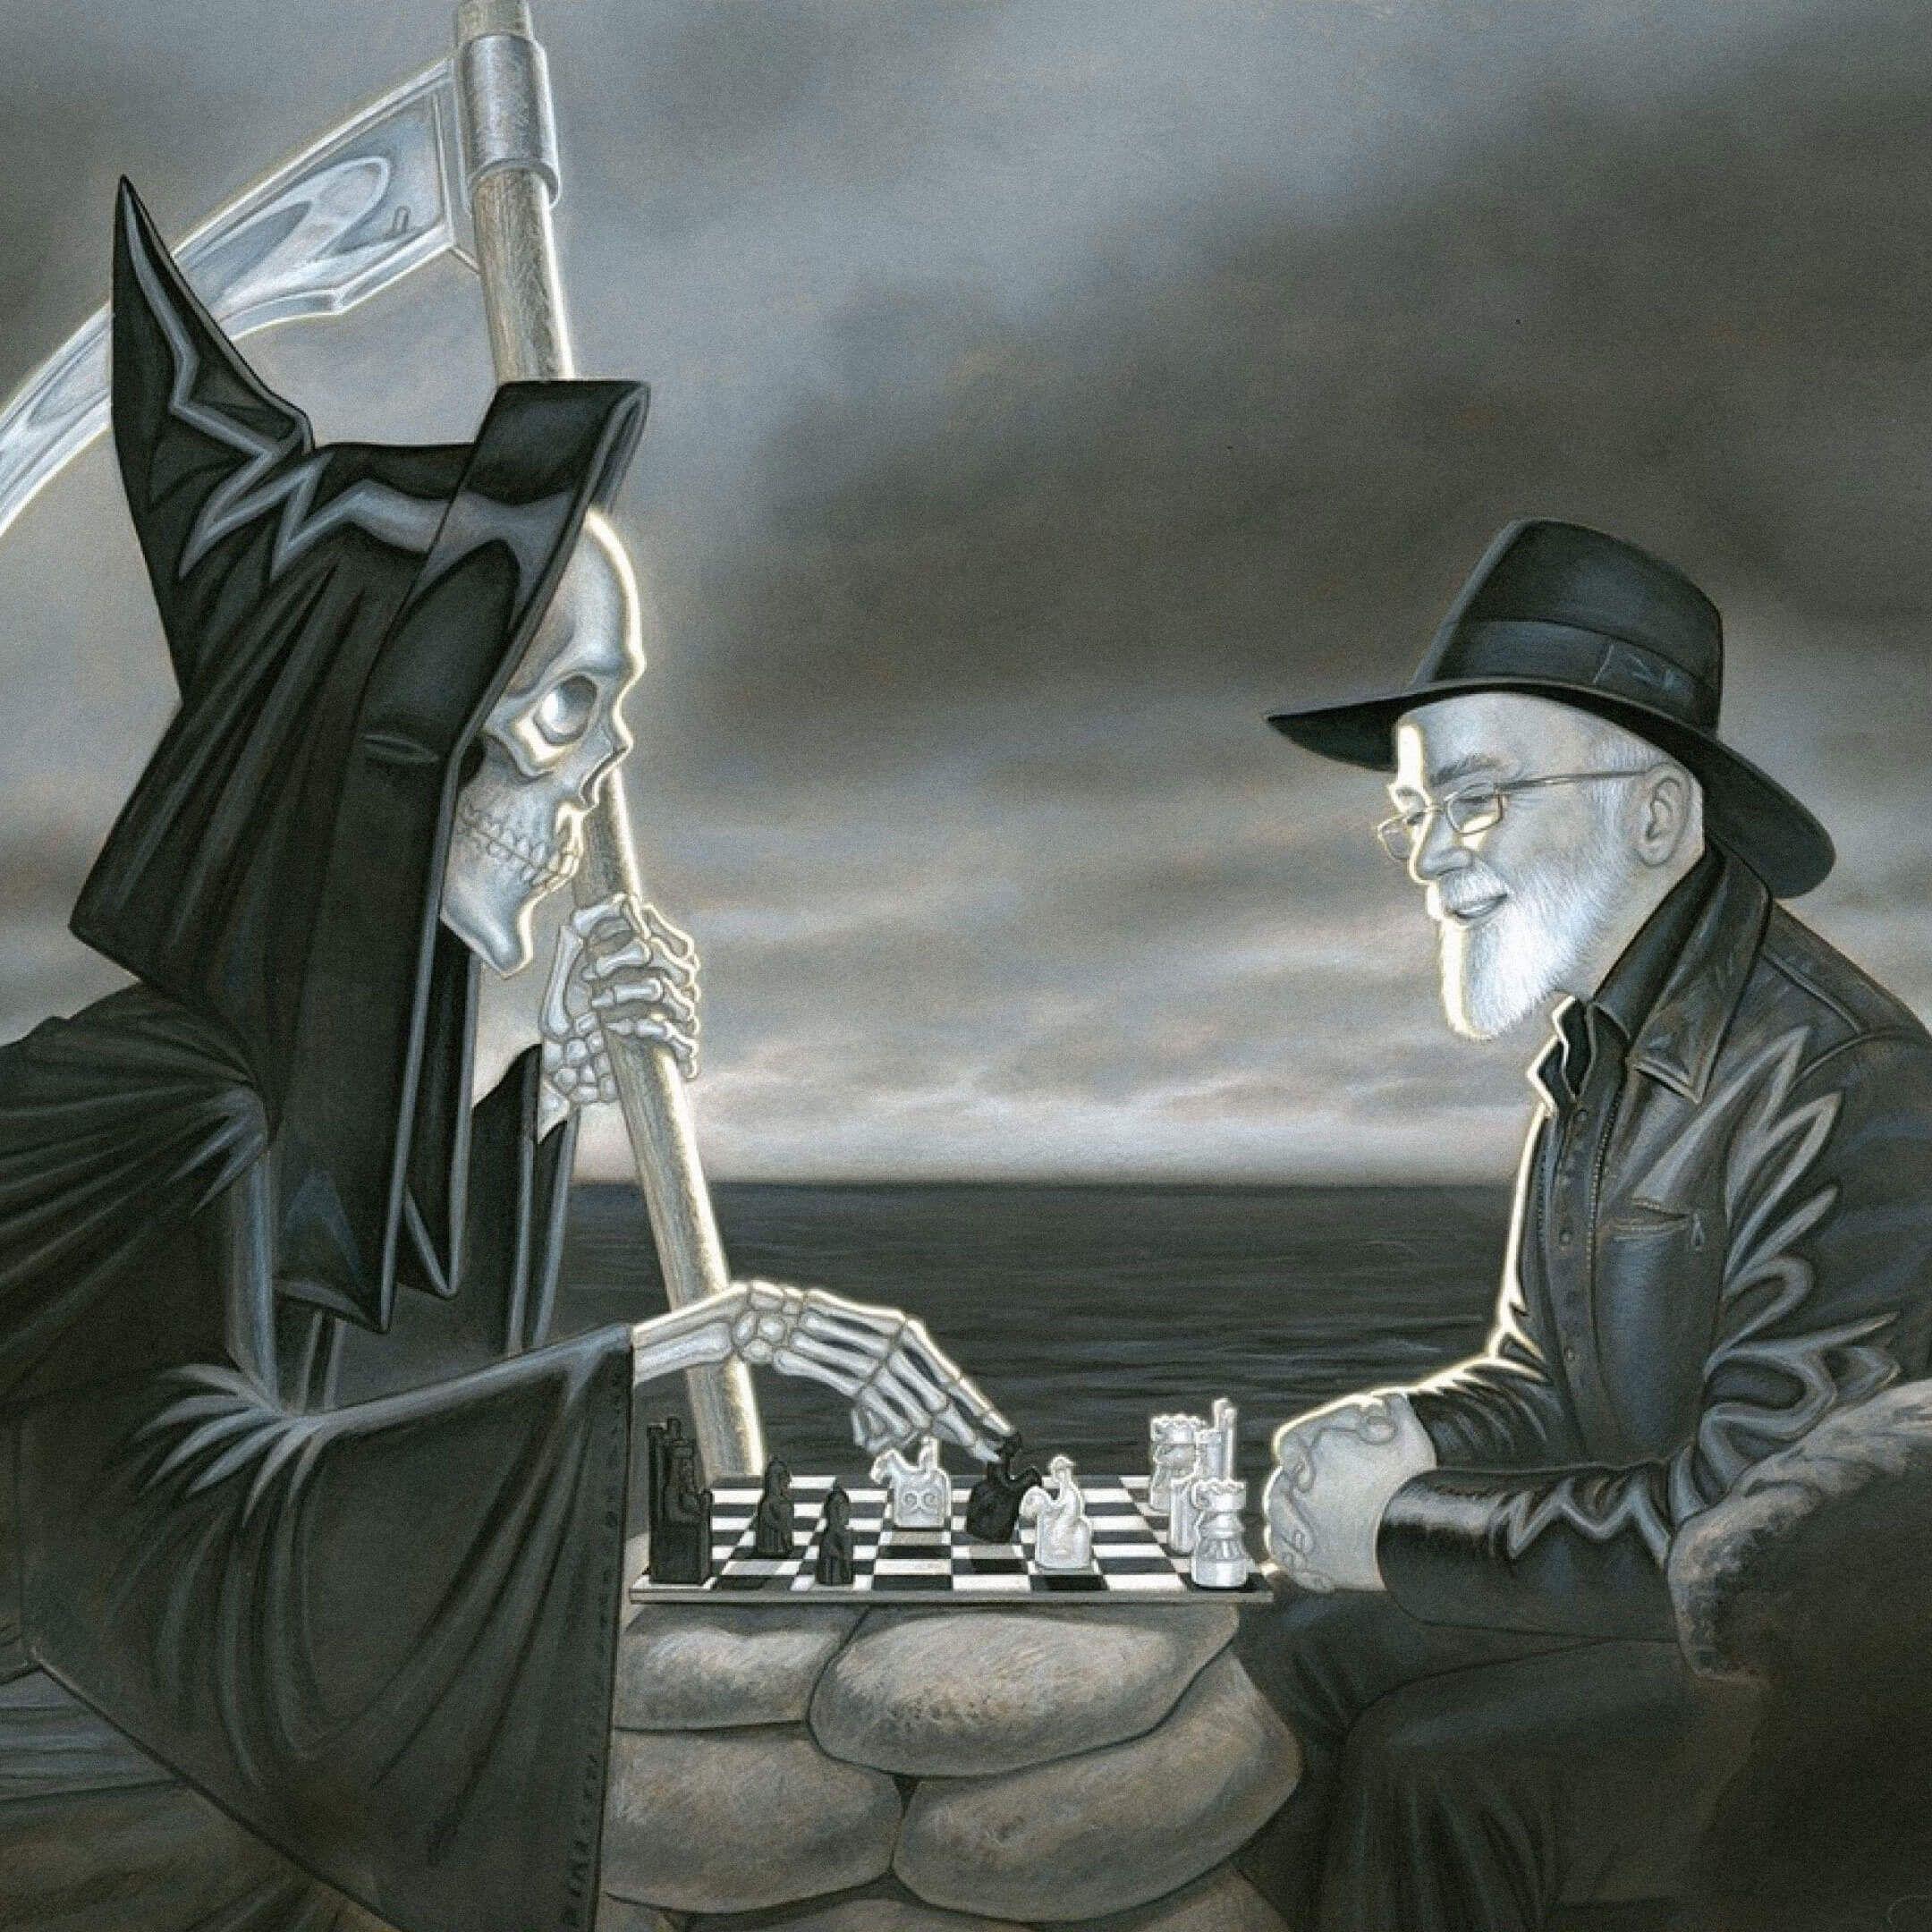 Иллюстрация собложки книги «Опечатки» Терри Пратчетта